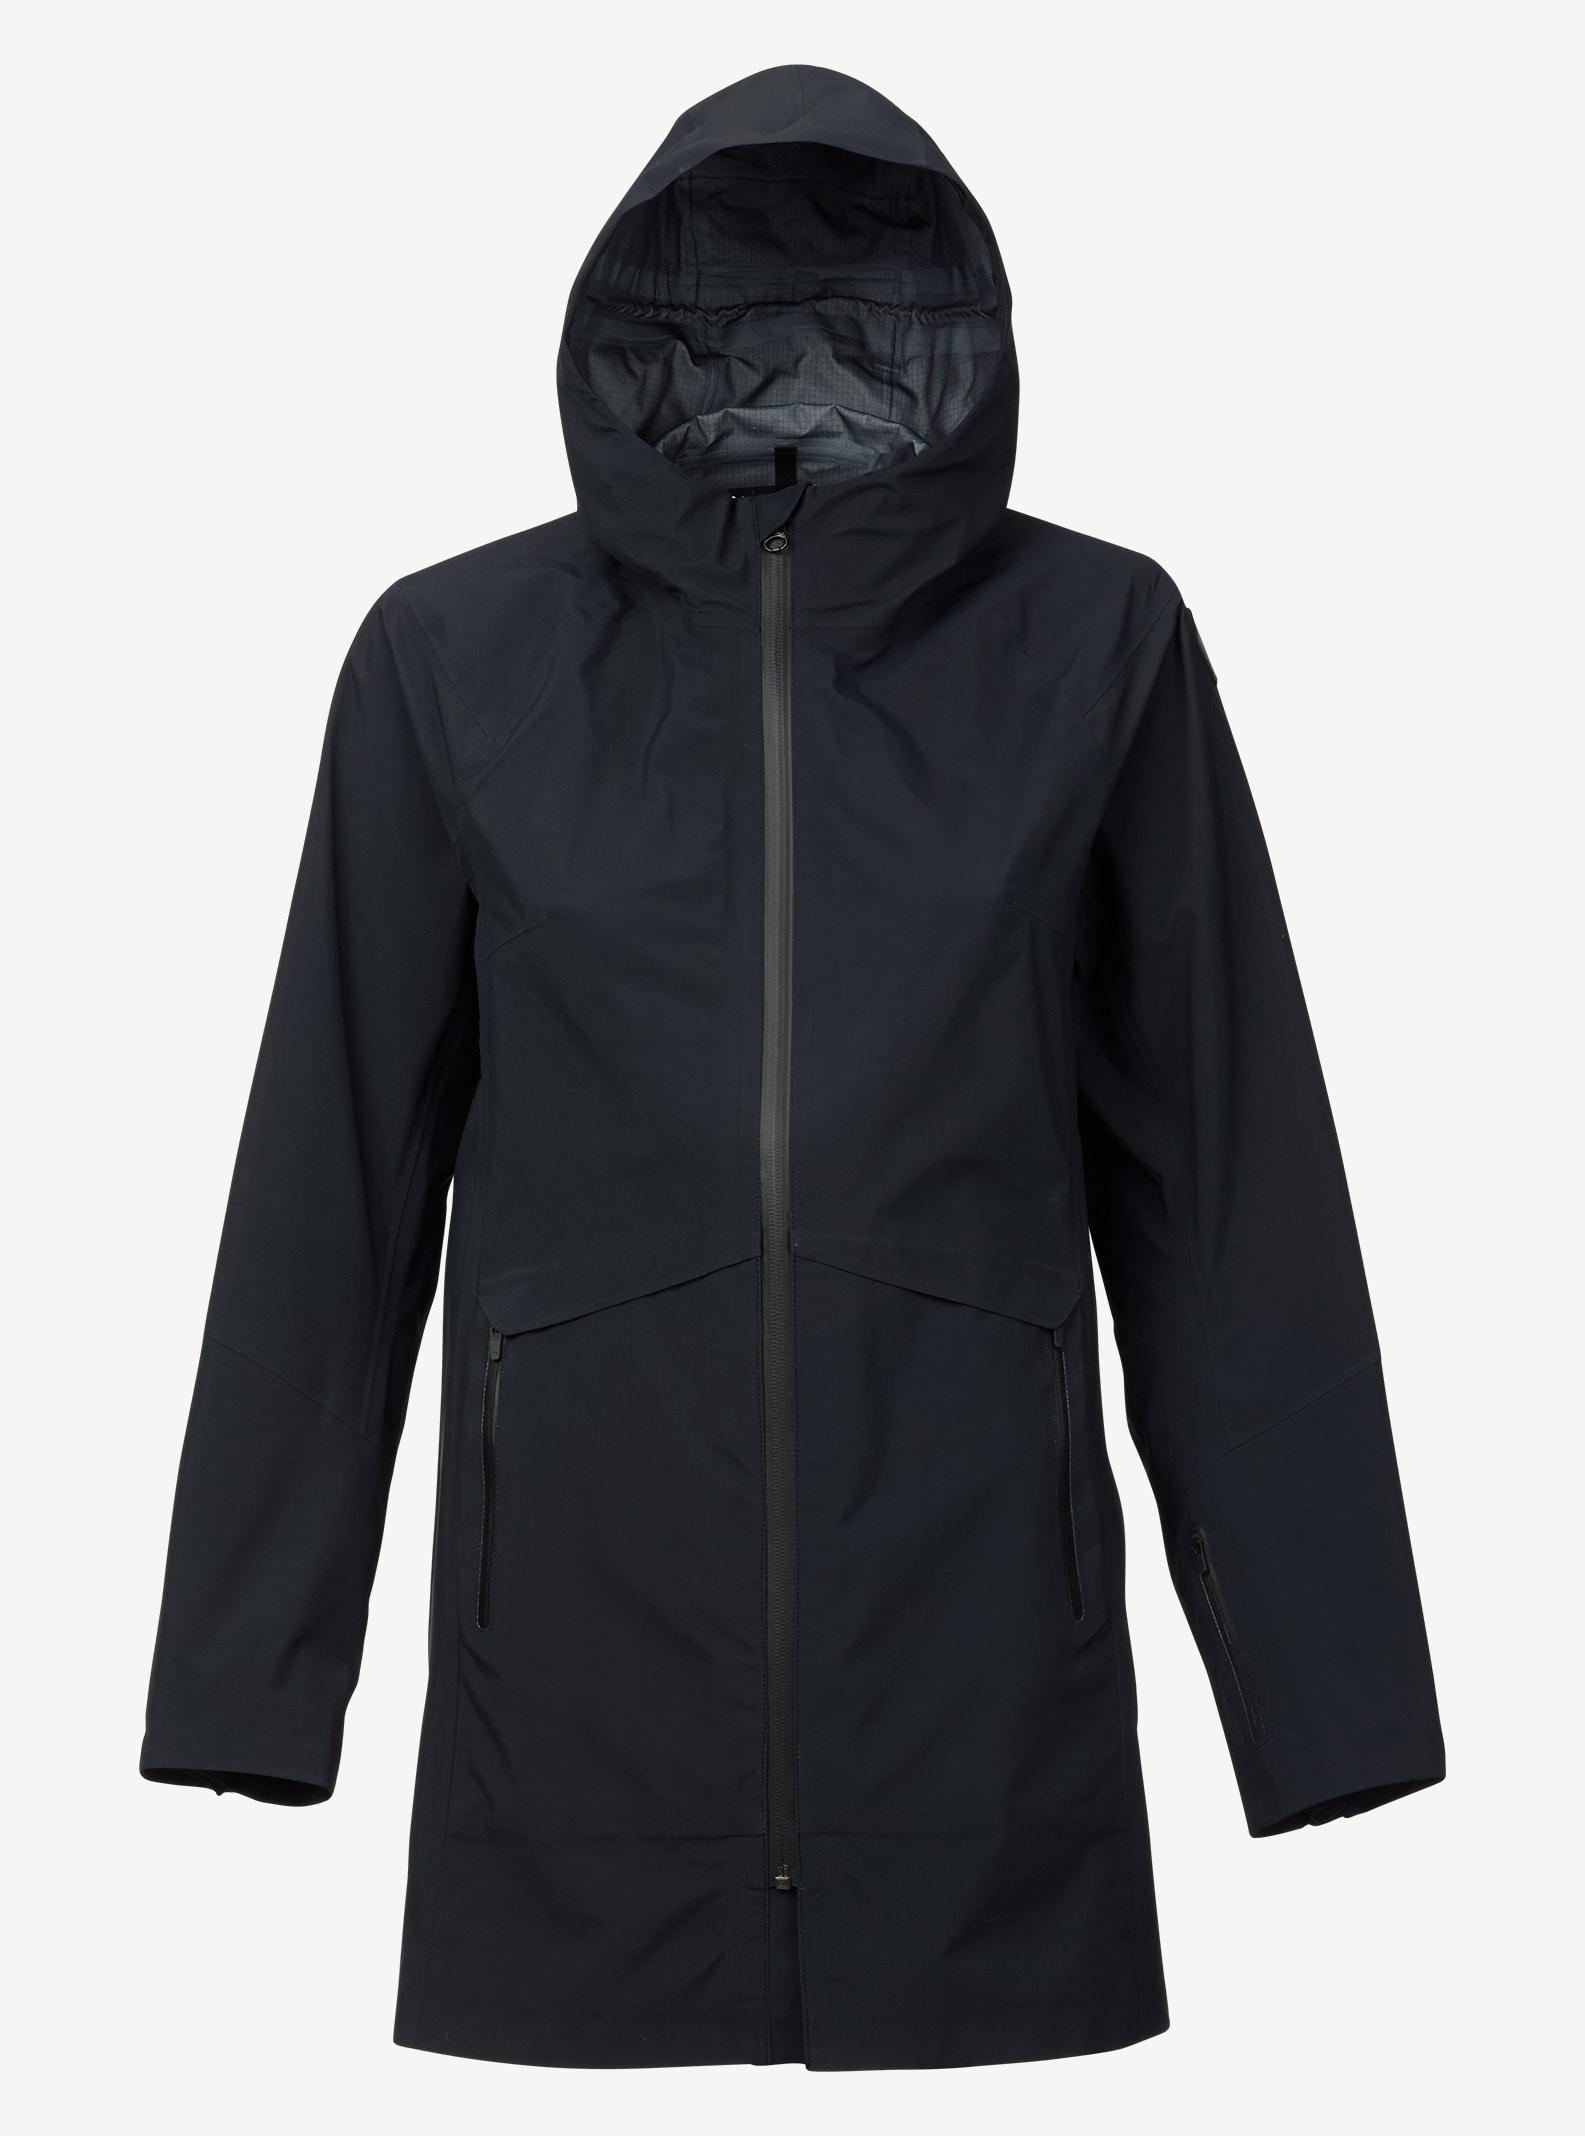 Burton GORE-TEX® 3L Cady Rain Parka shown in True Black